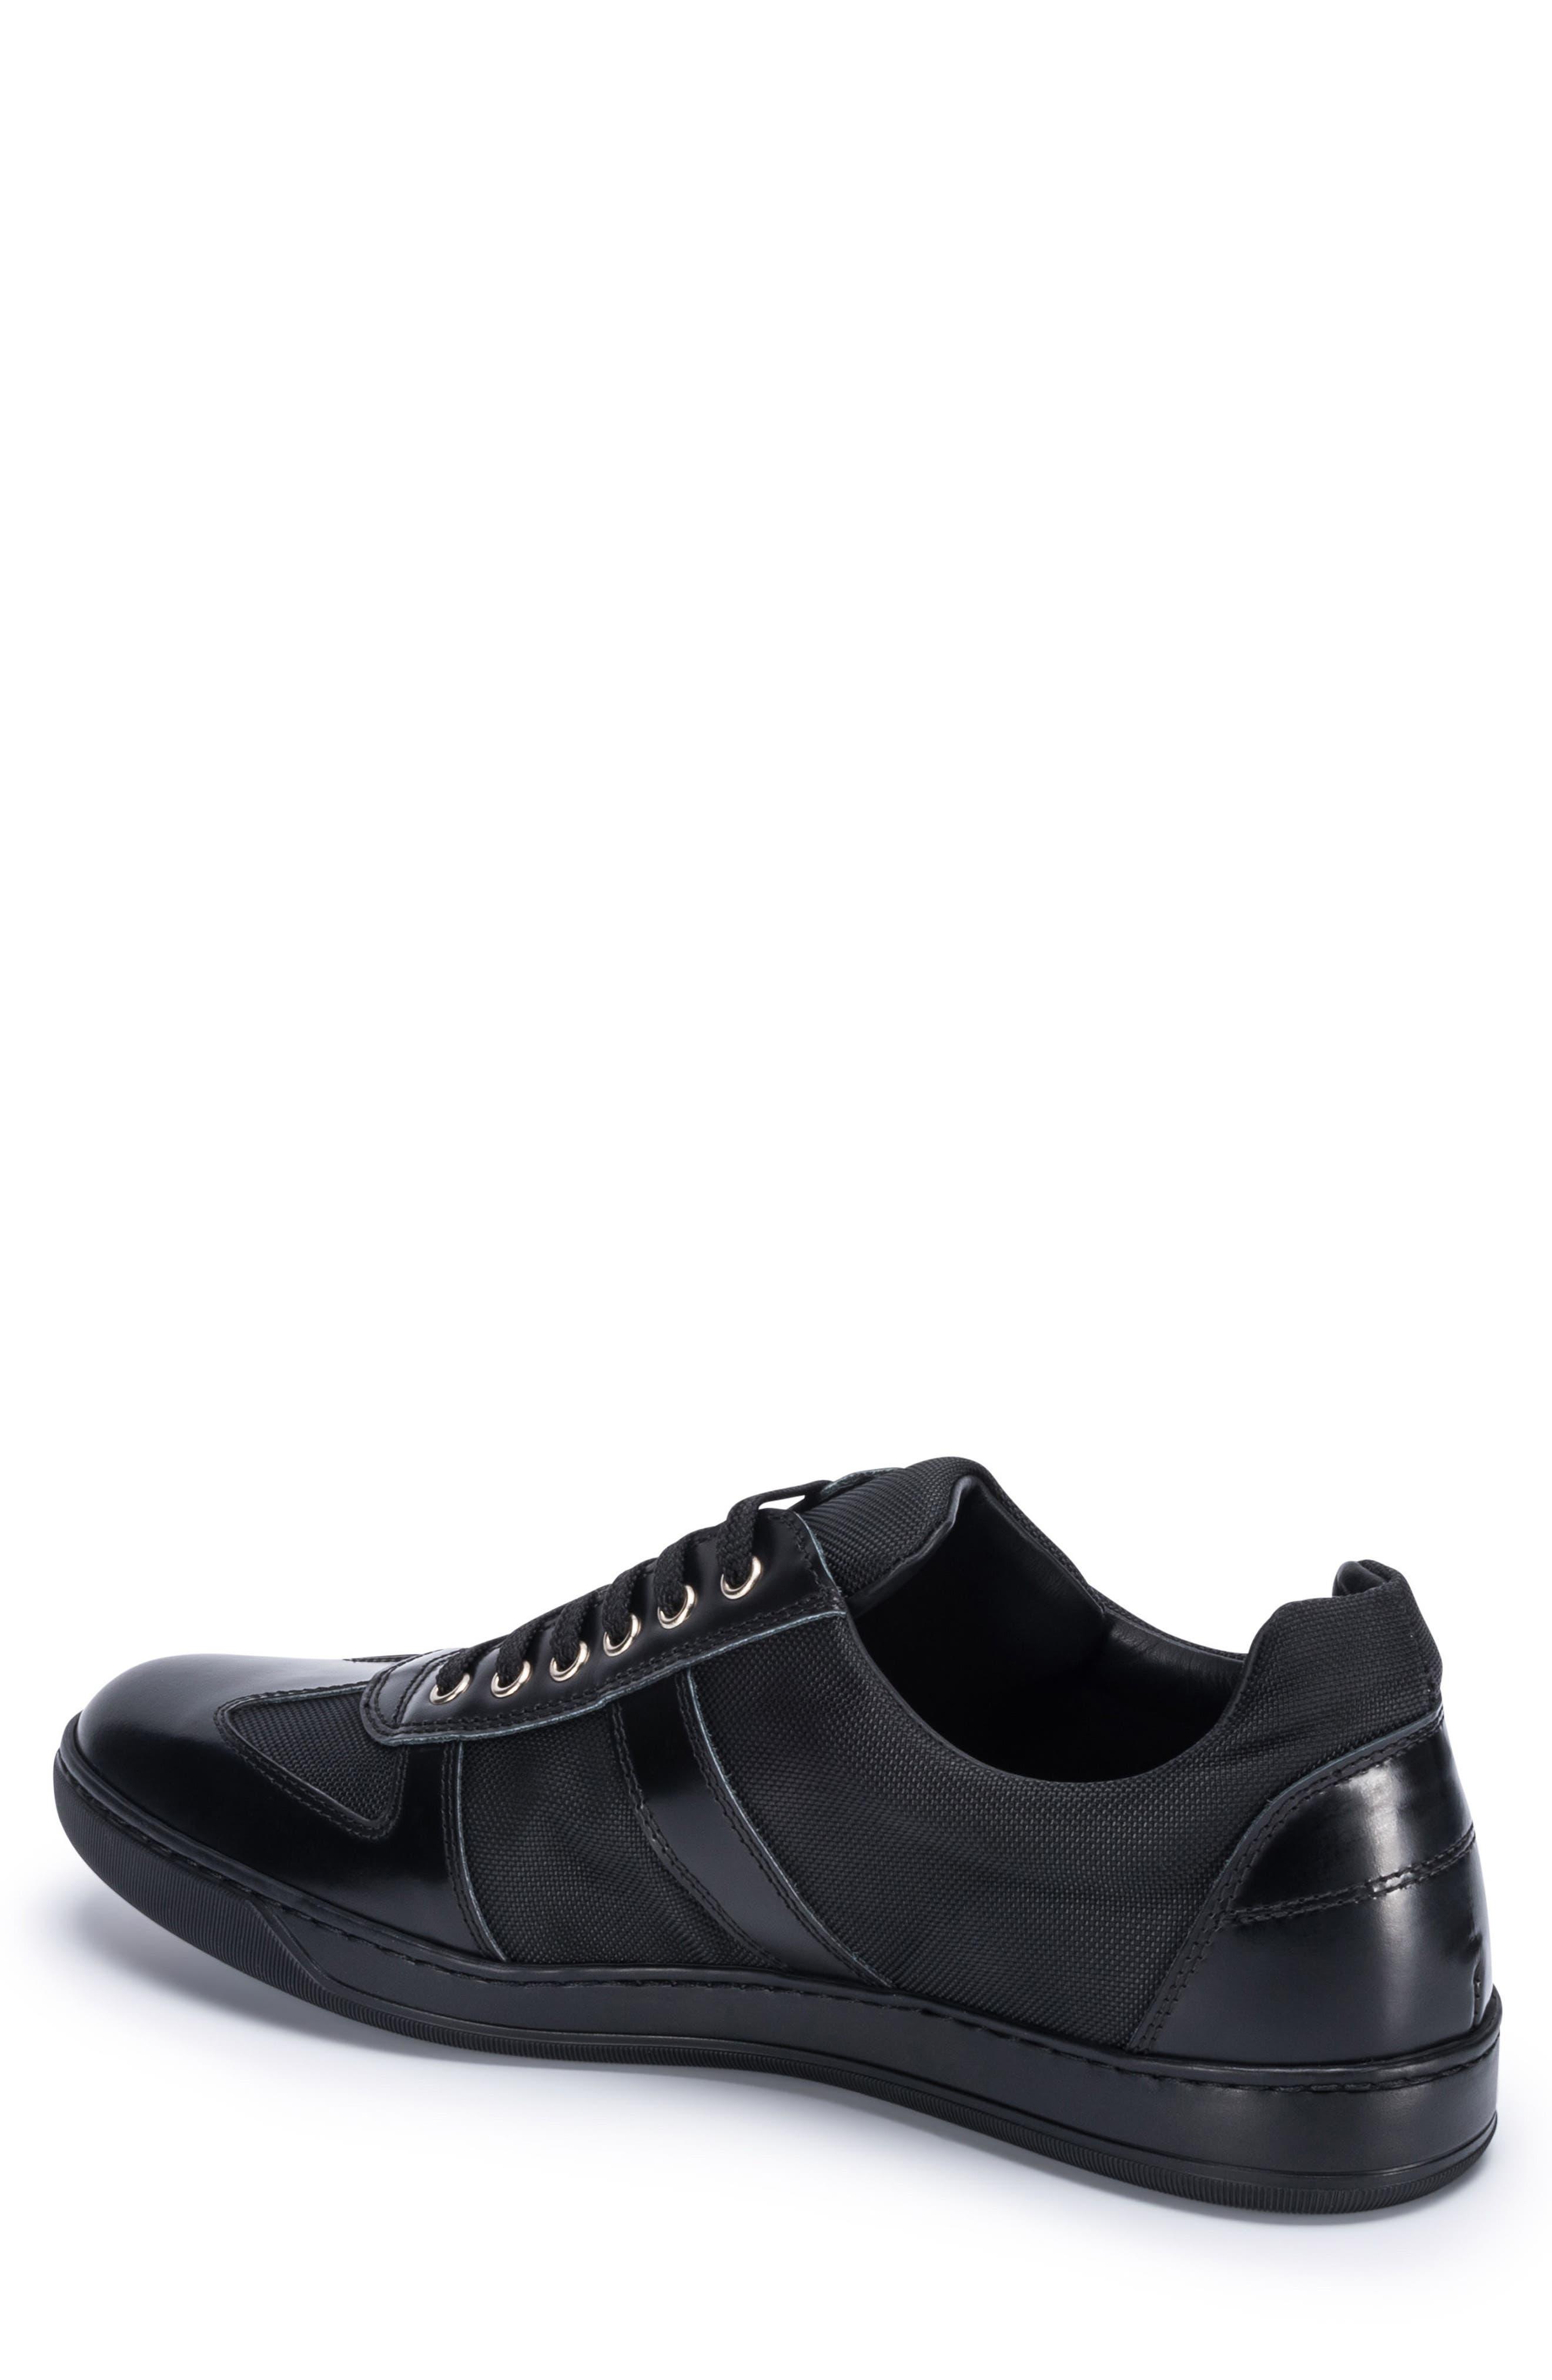 Paris Sneaker,                             Alternate thumbnail 2, color,                             BLACK